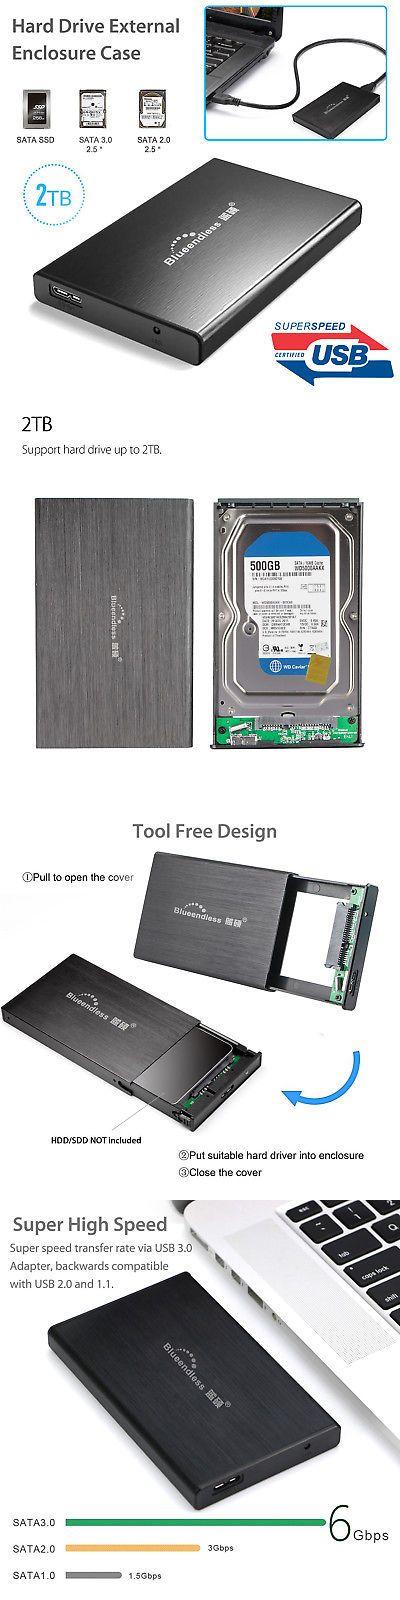 63fc31ae2945 External Hard Disk Drives 131553: External Backup Hard Drive Case 2Tb Usb  3.0 Enclosure 2.5 Portable Hdd Sata Ssd -… | External Hard Disk Drives  131553 ...